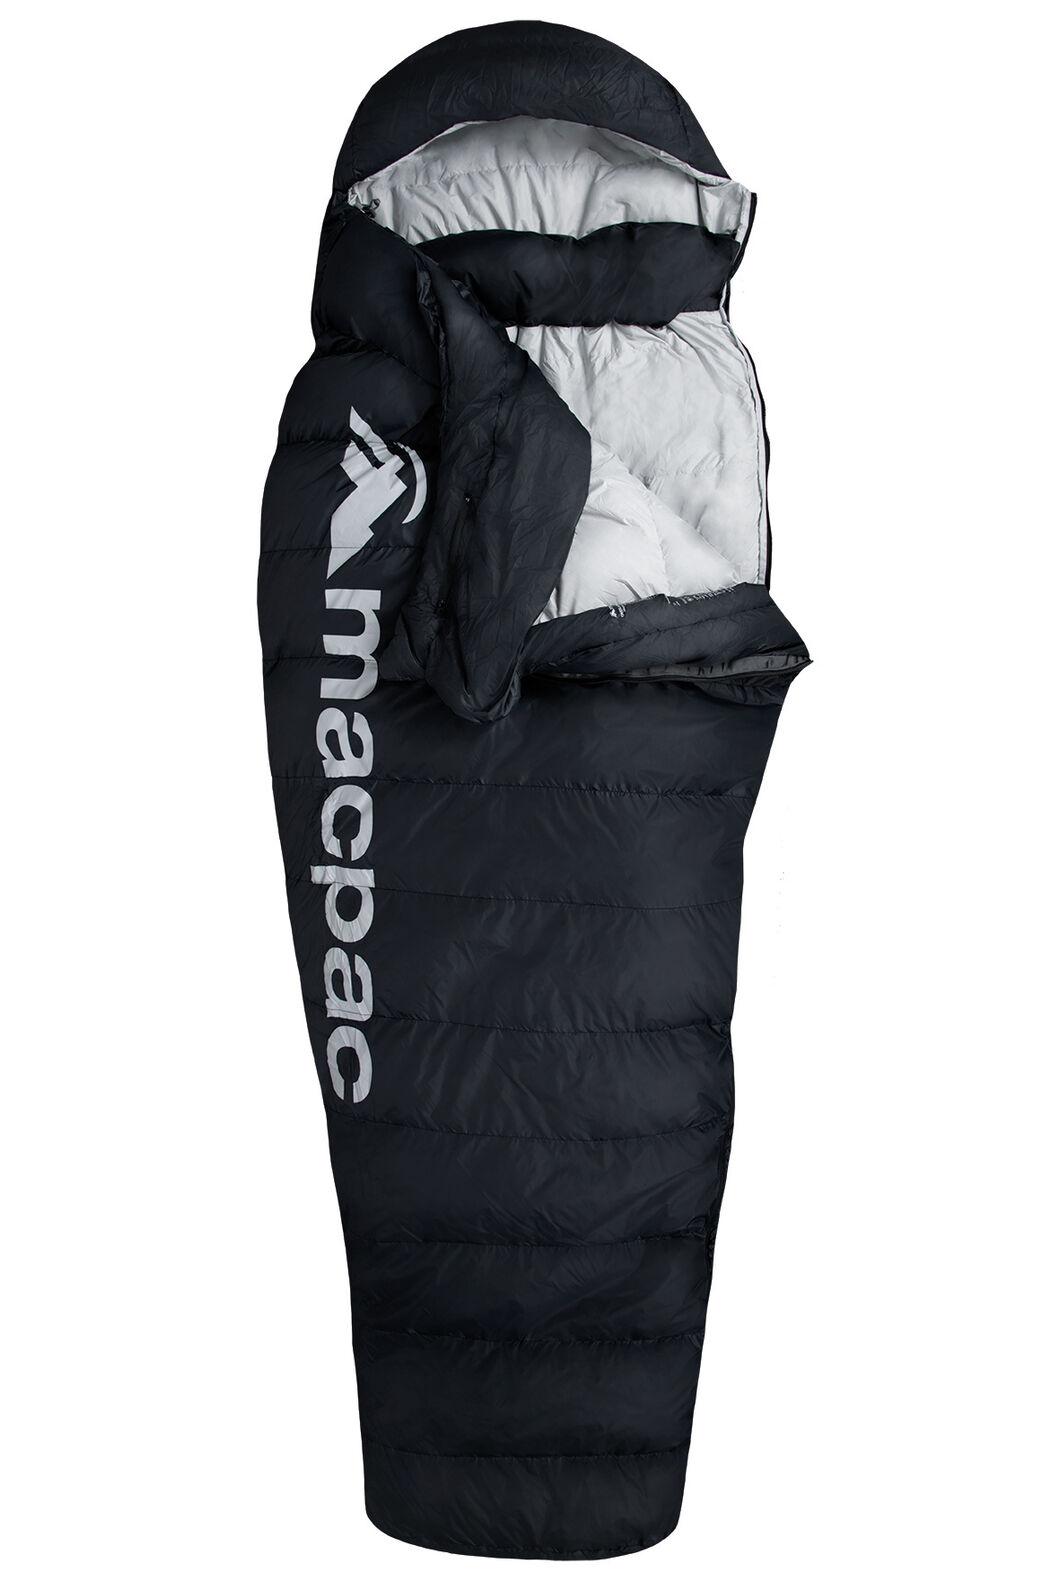 Macpac Overland Down 400 Sleeping Bag - Women's, Black, hi-res